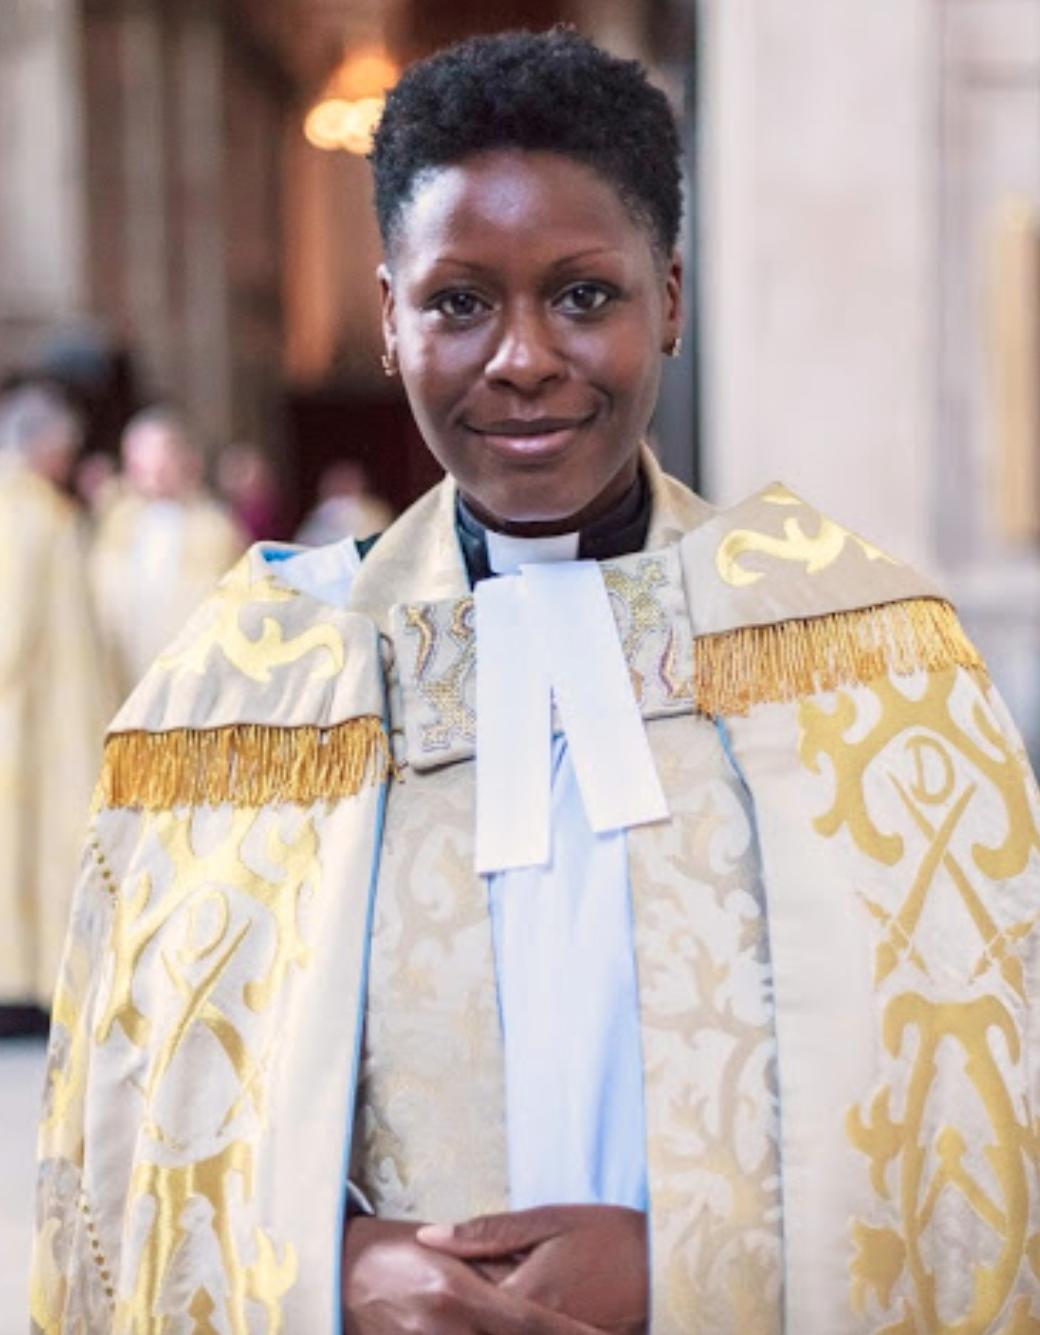 Above: The Archdeacon of Hackney, LizAdekunle is a big Christmas card fan.